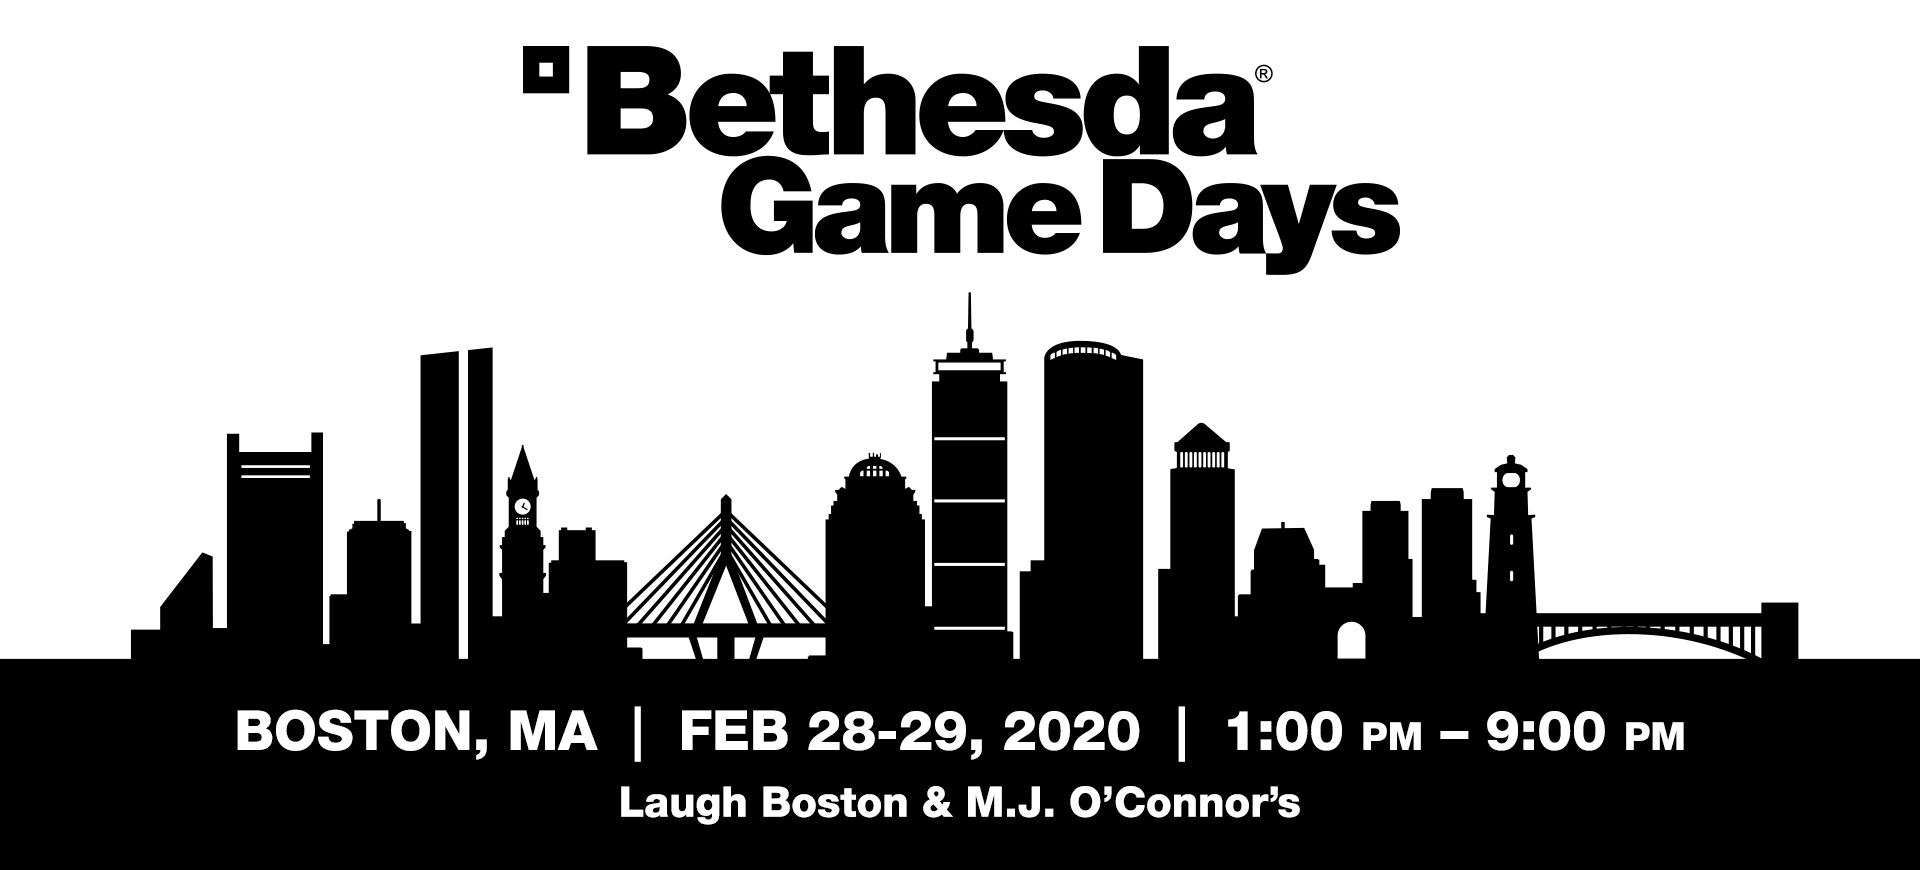 Bethesda GDays PaxEast 2020 Bnet 1920x870 MainAnnounce-03